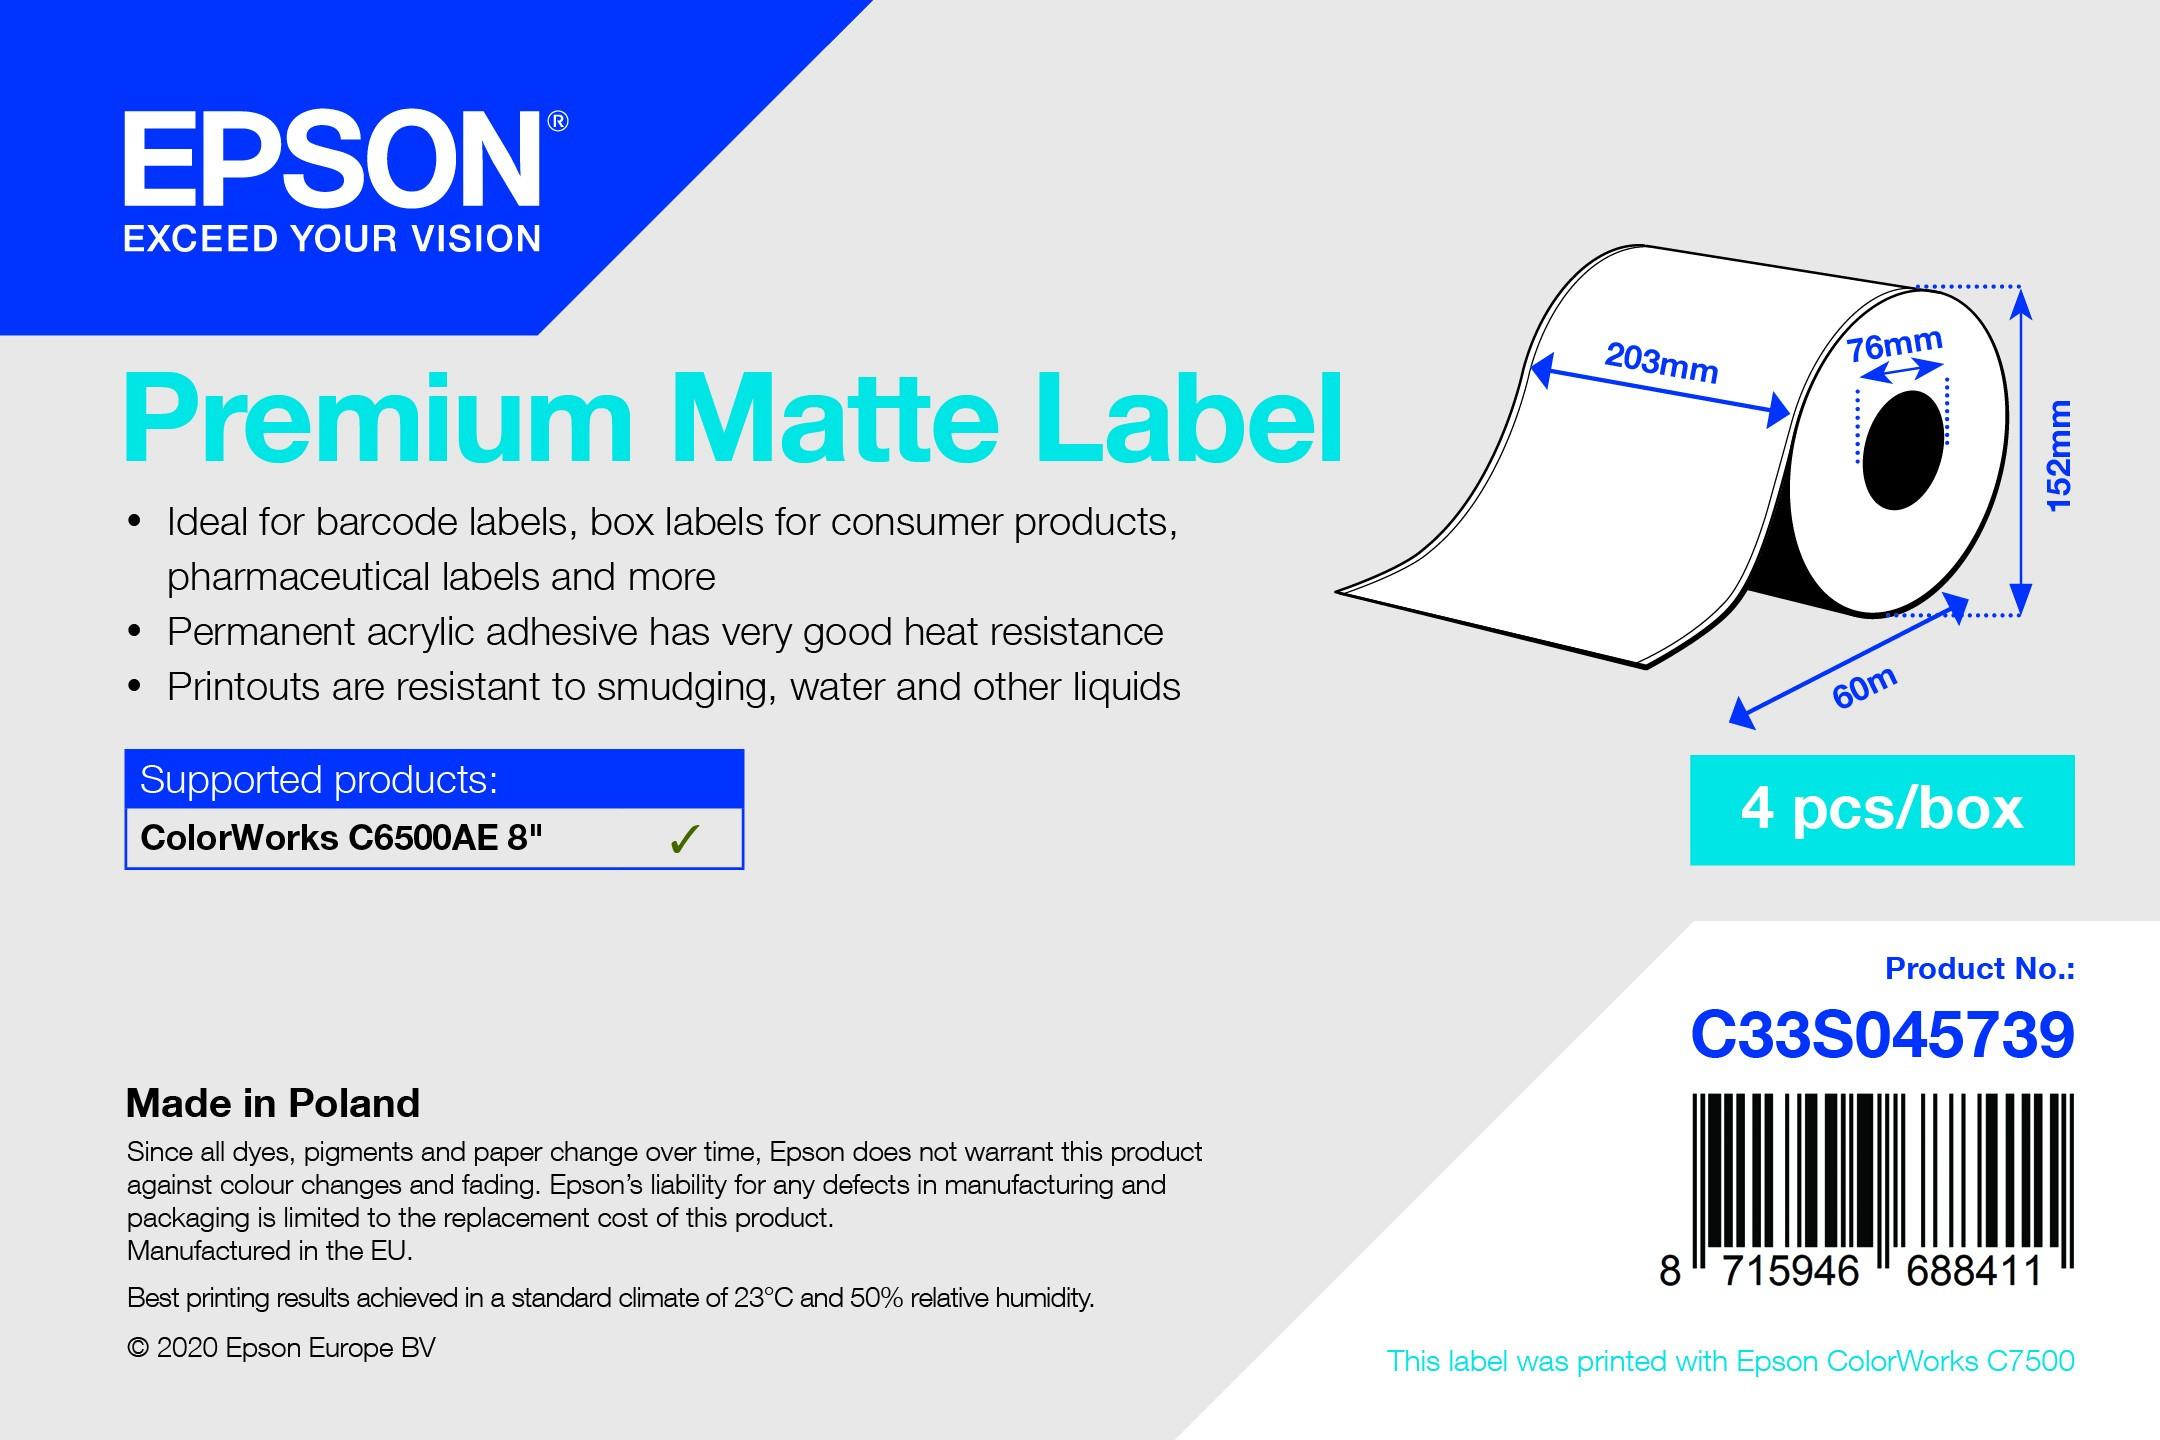 Epson 203mm X 60m matt címke